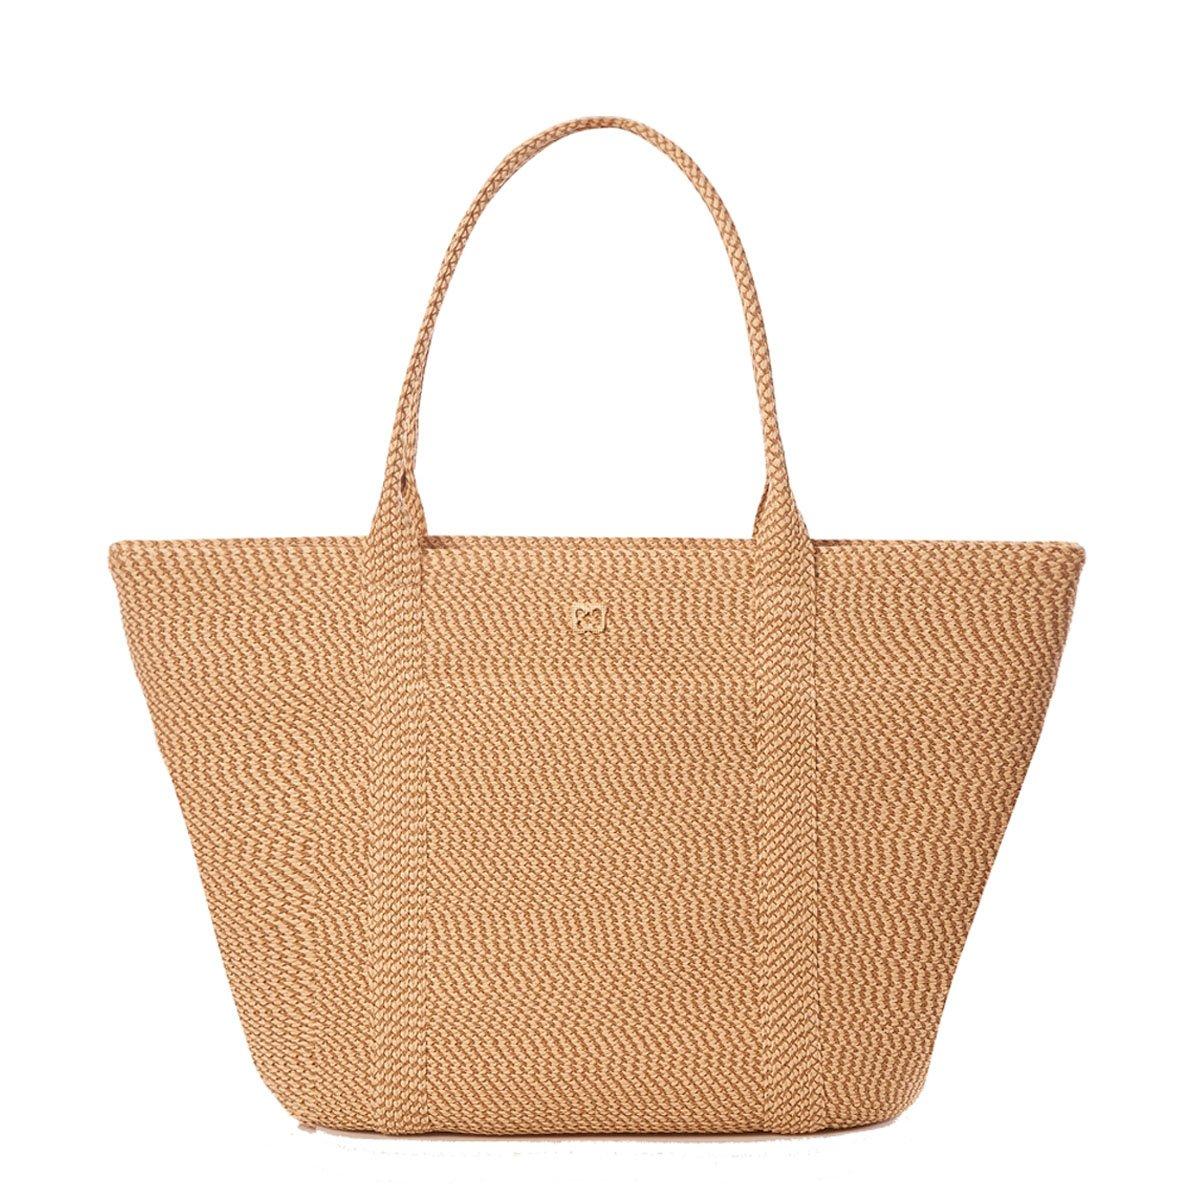 Eric Javits Luxury Fashion Designer Women's Handbag - Prep Tote - Peanut by Eric Javits